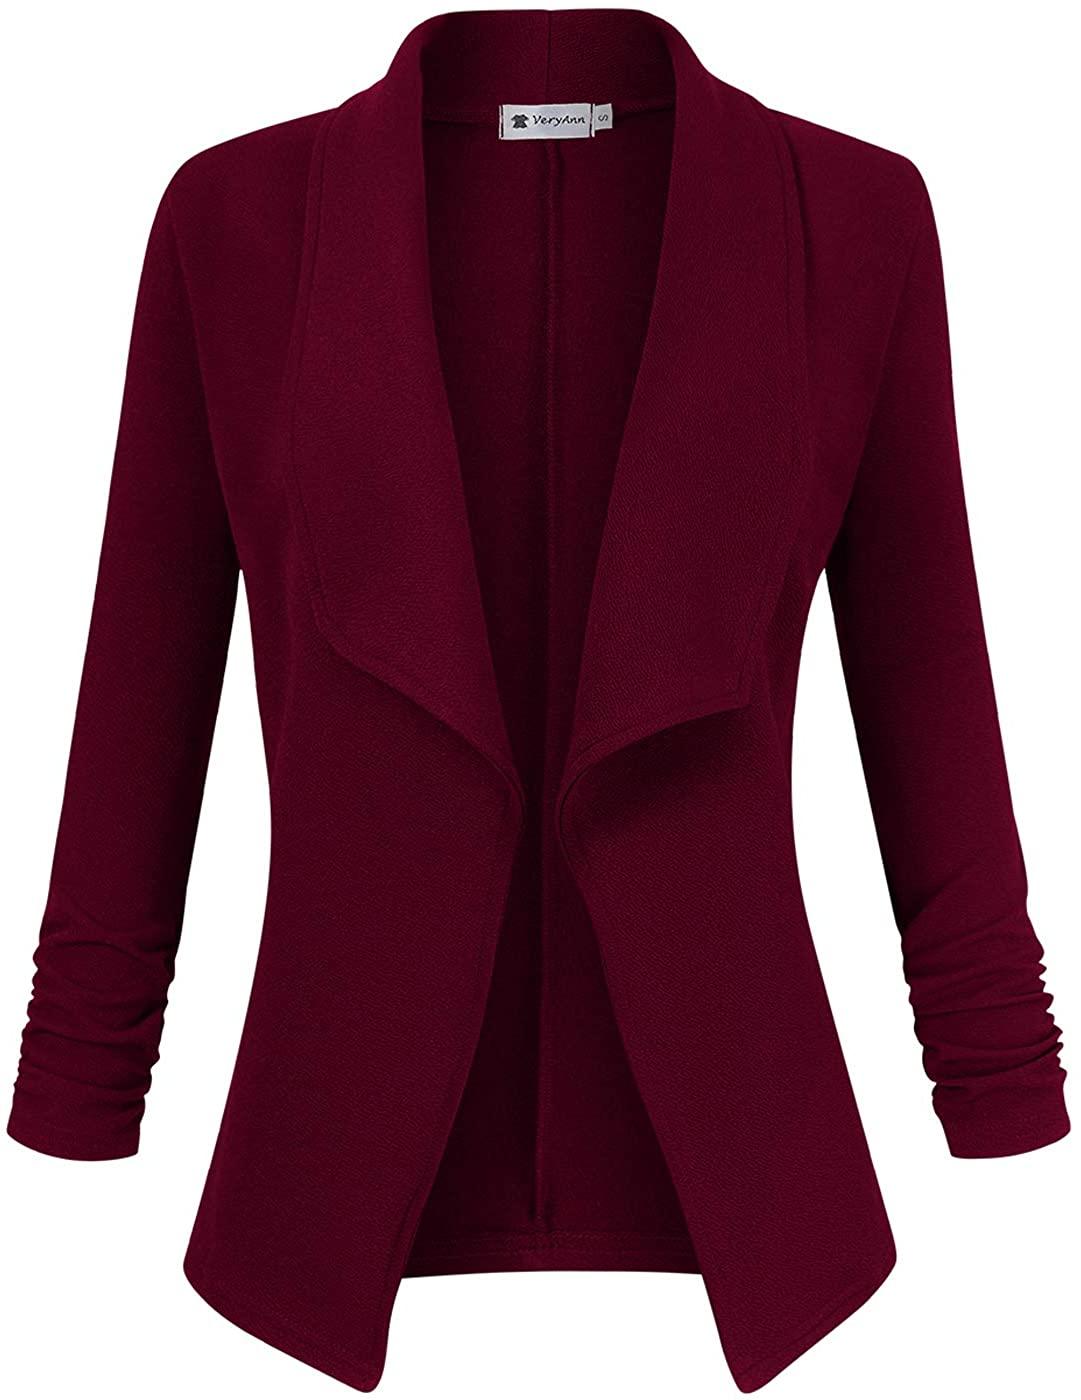 VeryAnn Women's 3/4 Sleeve Solid Blazer Open Front Cardigan Jacket for Work Office